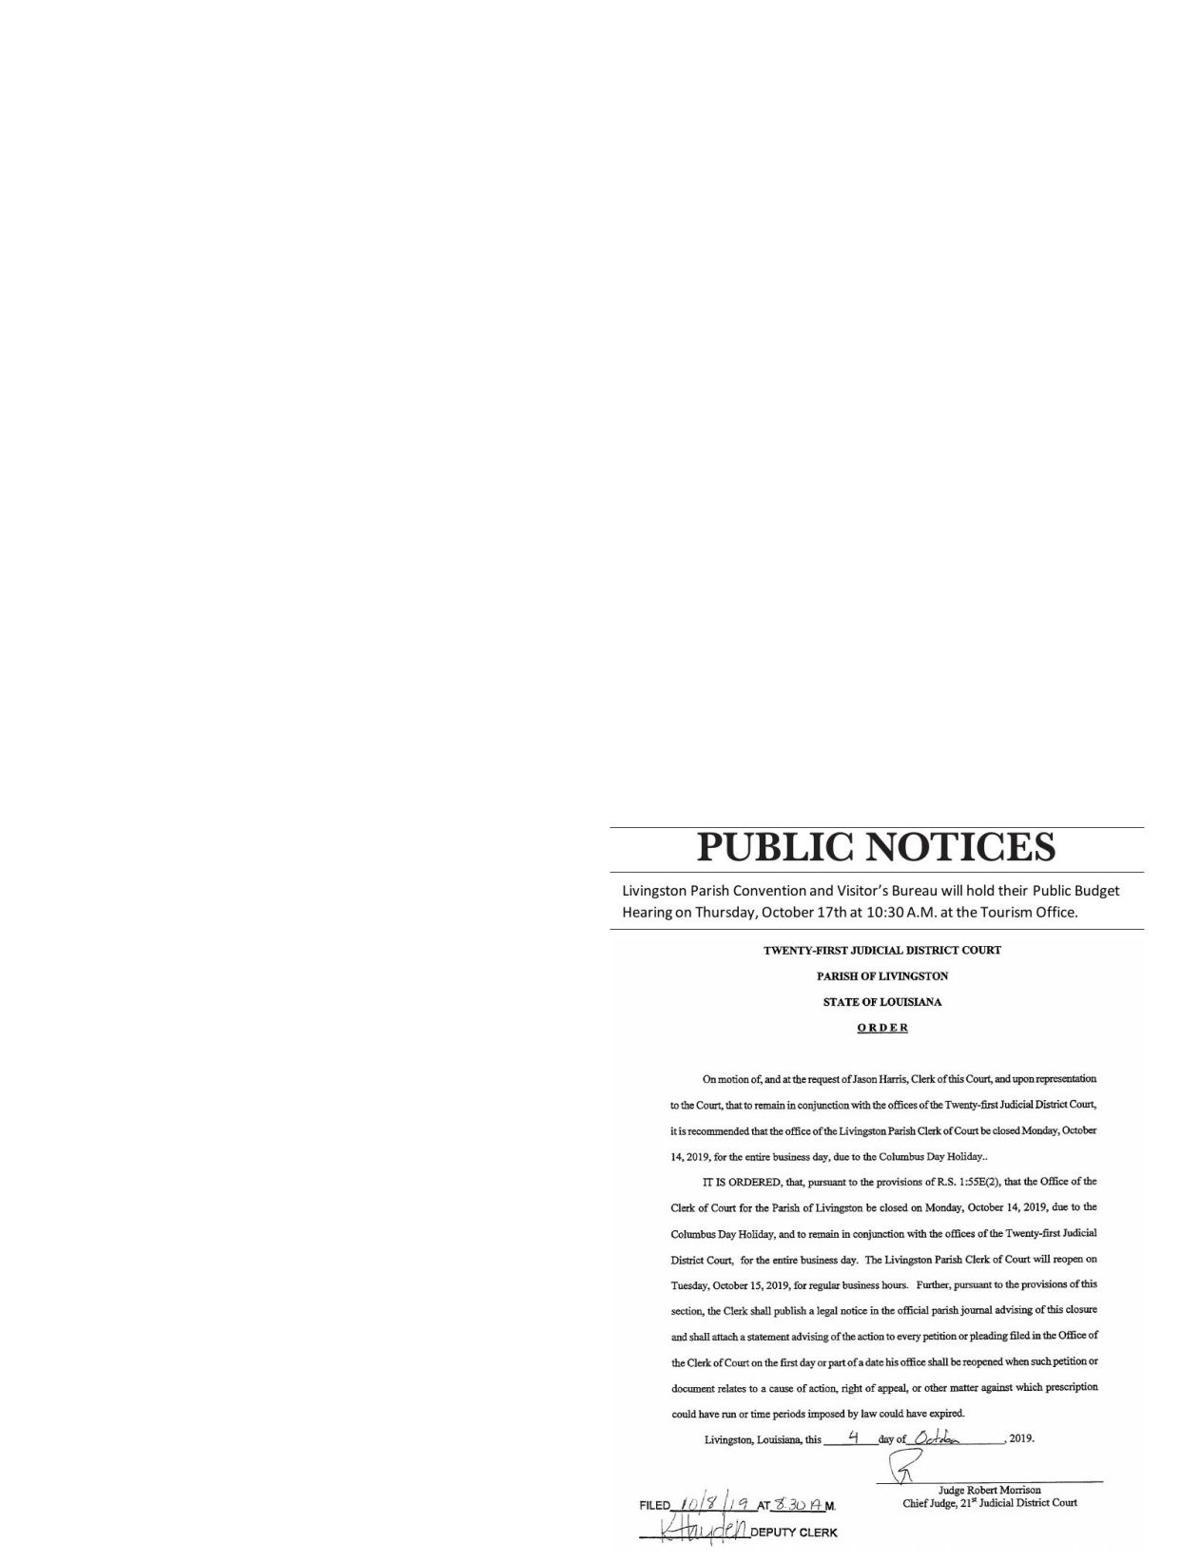 Public Notices published October 10, 2019